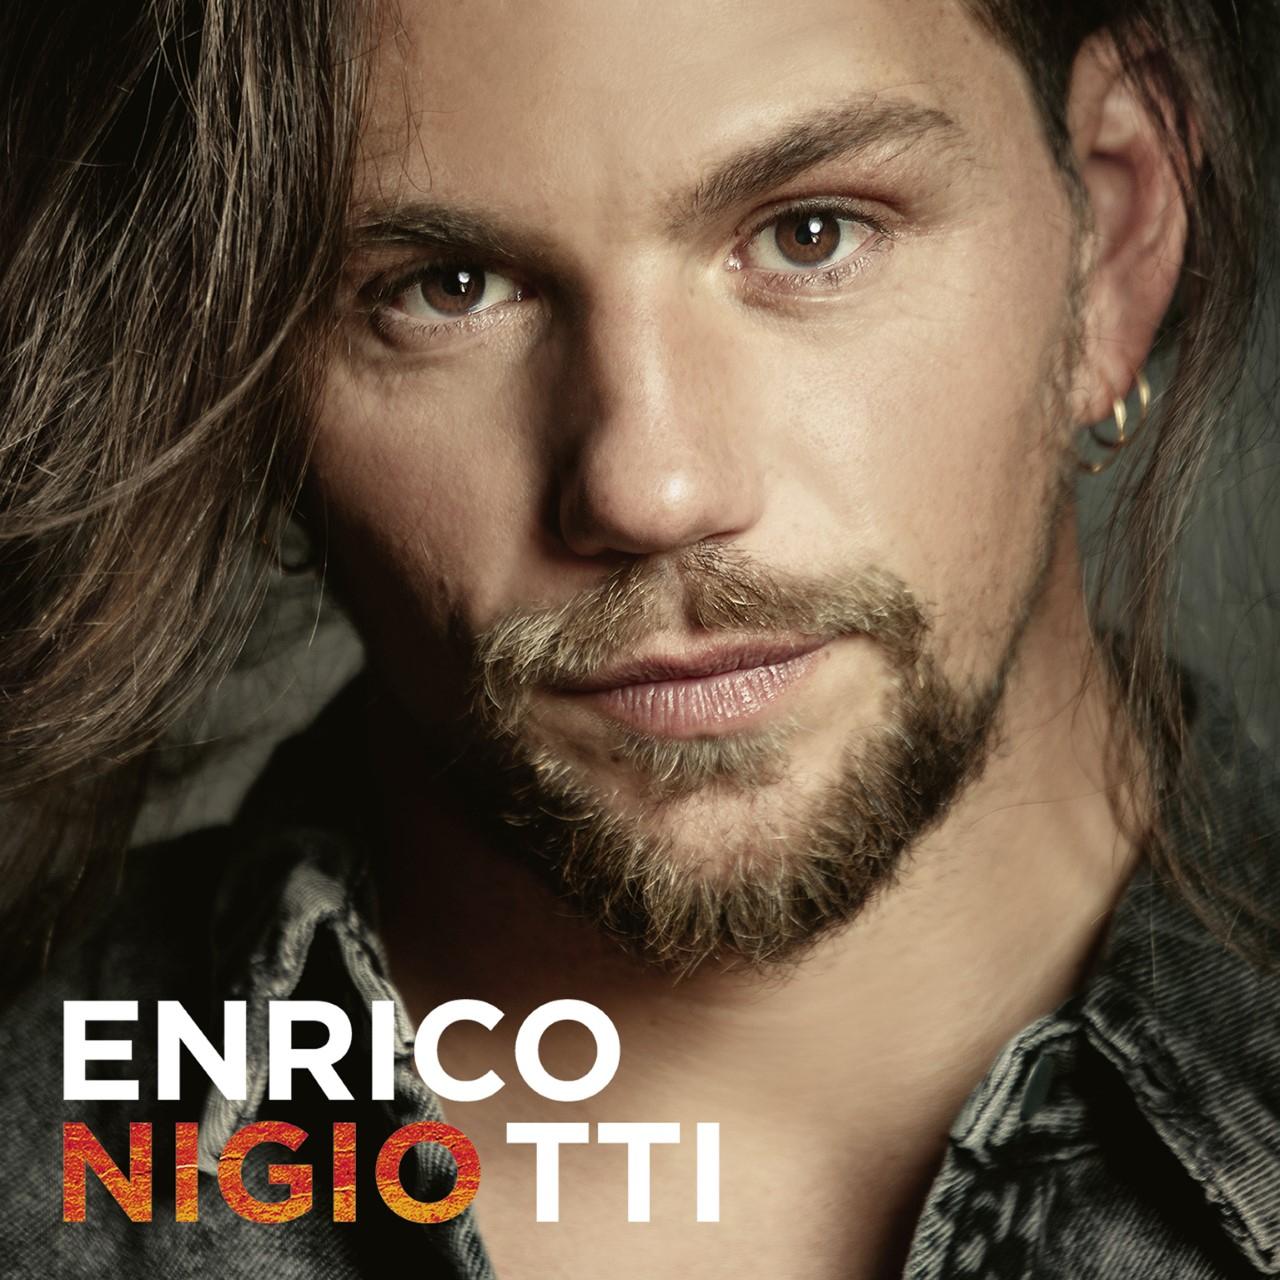 ENRICO NIGIOTTI - NIGIO (SANREMO 2020) (CD)